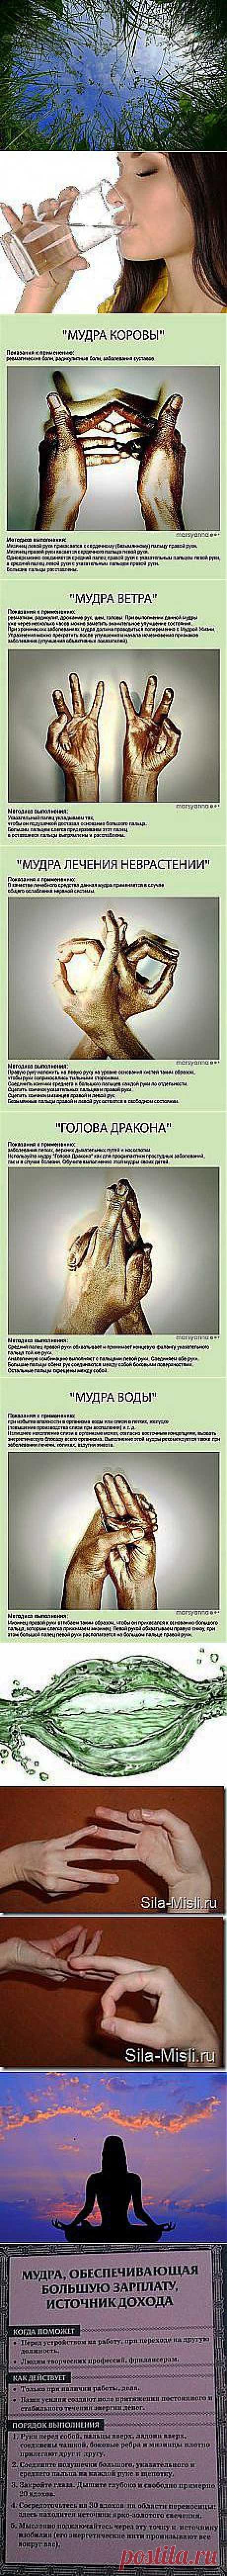 Valentina Rodina: the magic rituals | Posted signs